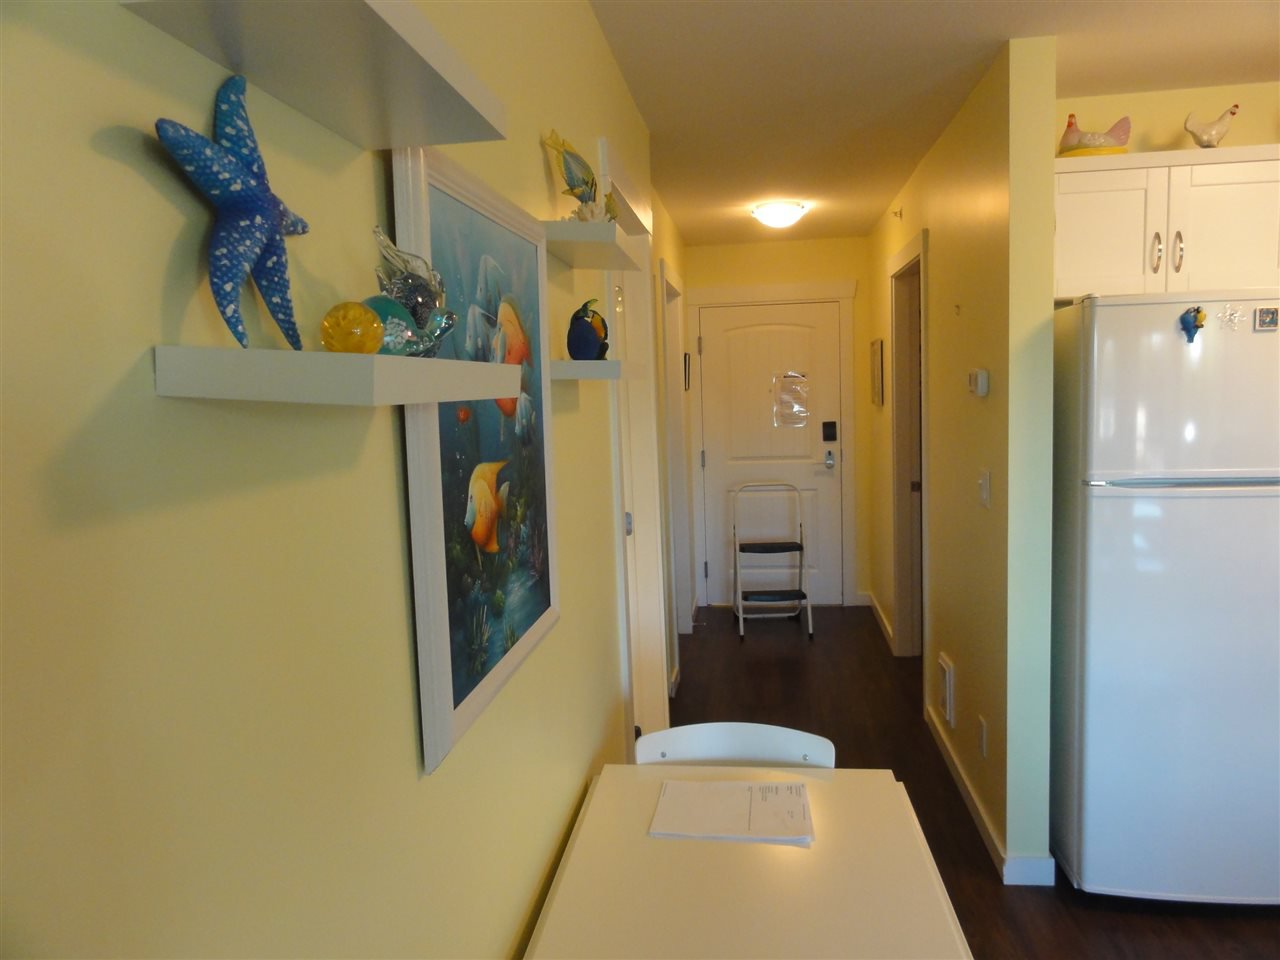 "Photo 5: Photos: 431 22323 48 Avenue in Langley: Murrayville Condo for sale in ""AVALON GARDENS"" : MLS®# R2134591"